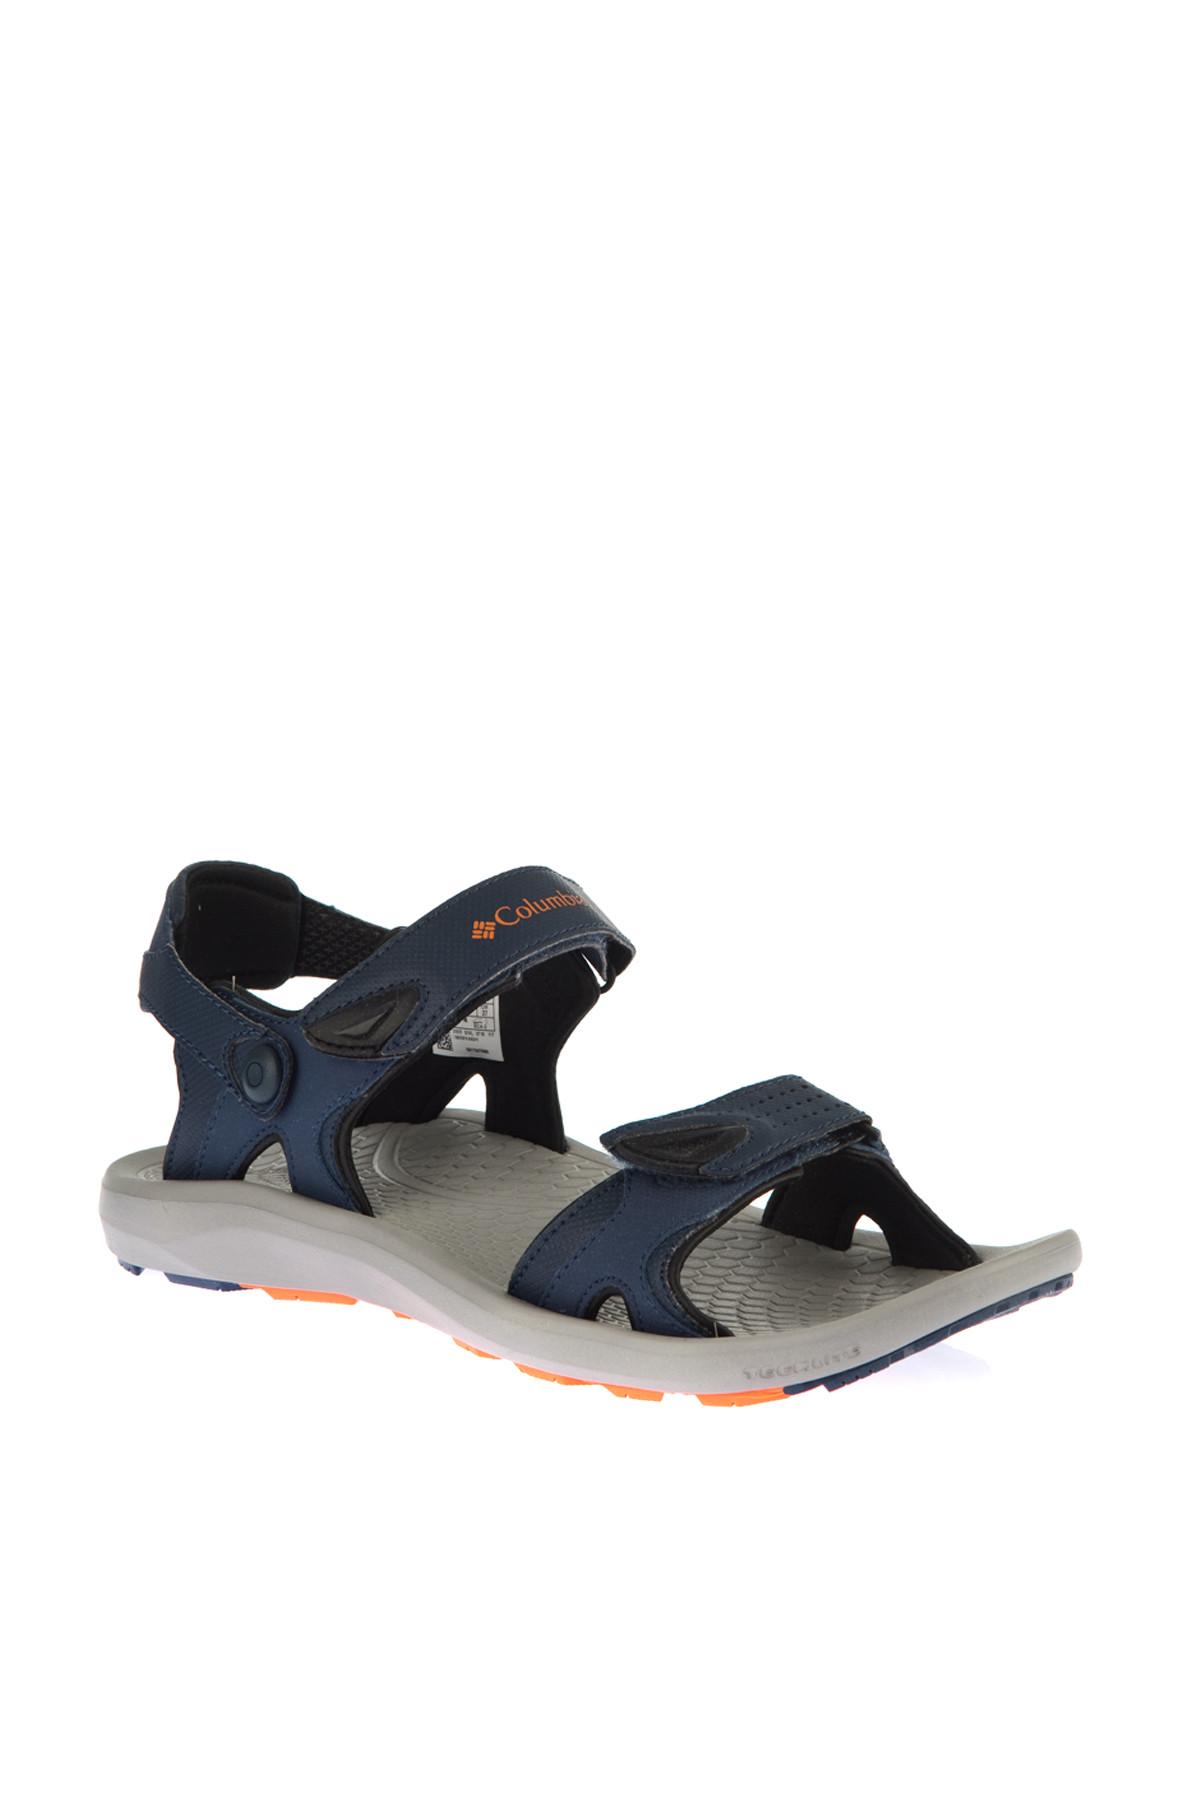 Erkek Bm4514 Techsun Interchange Sandalet 1718441492